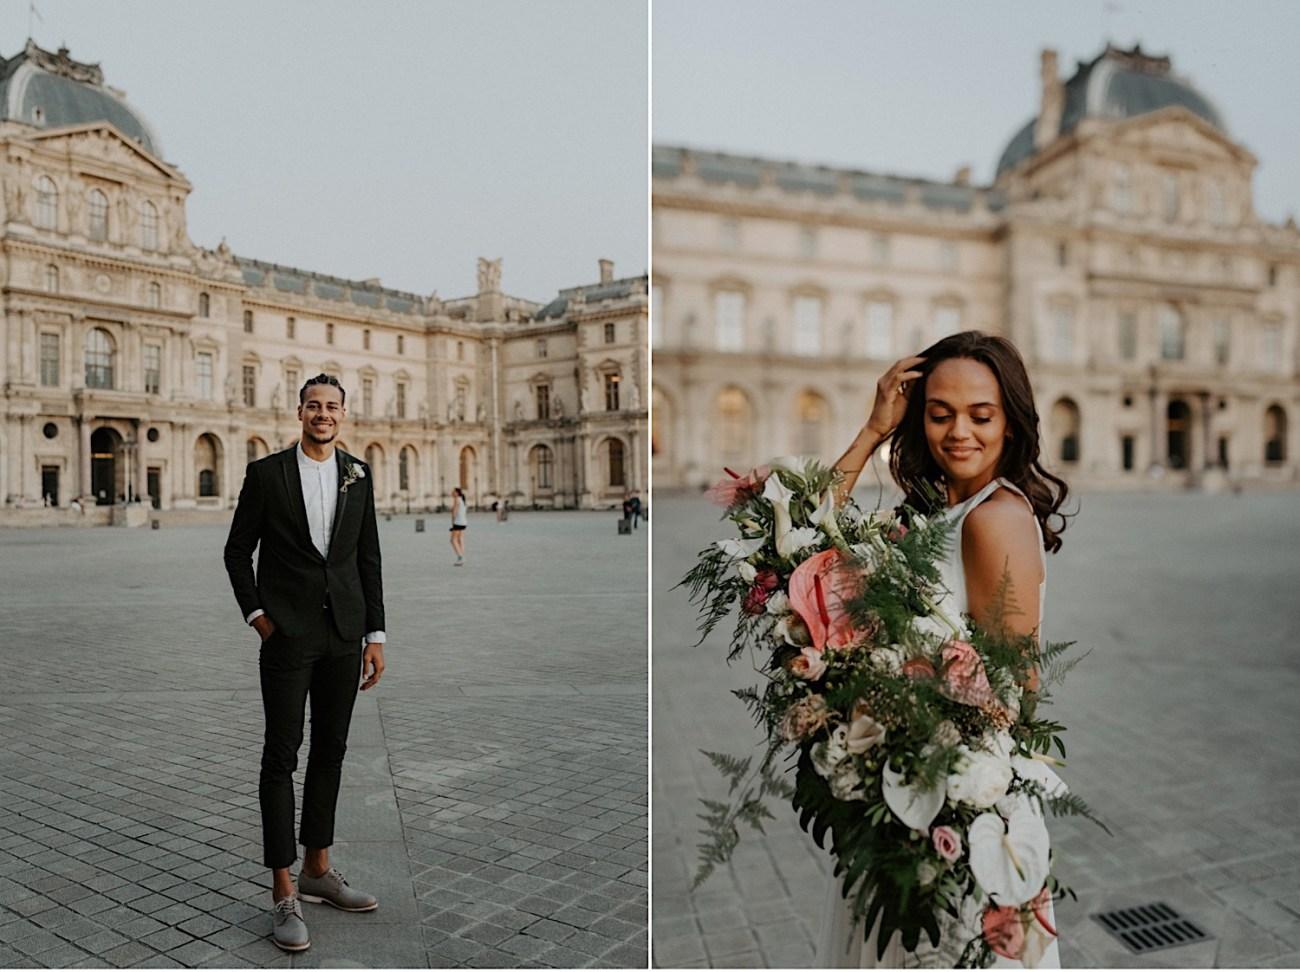 Paris Louvre Wedding Photos Paris Wedding Photographer Destination Wedding France Anais Possamai Photography 36